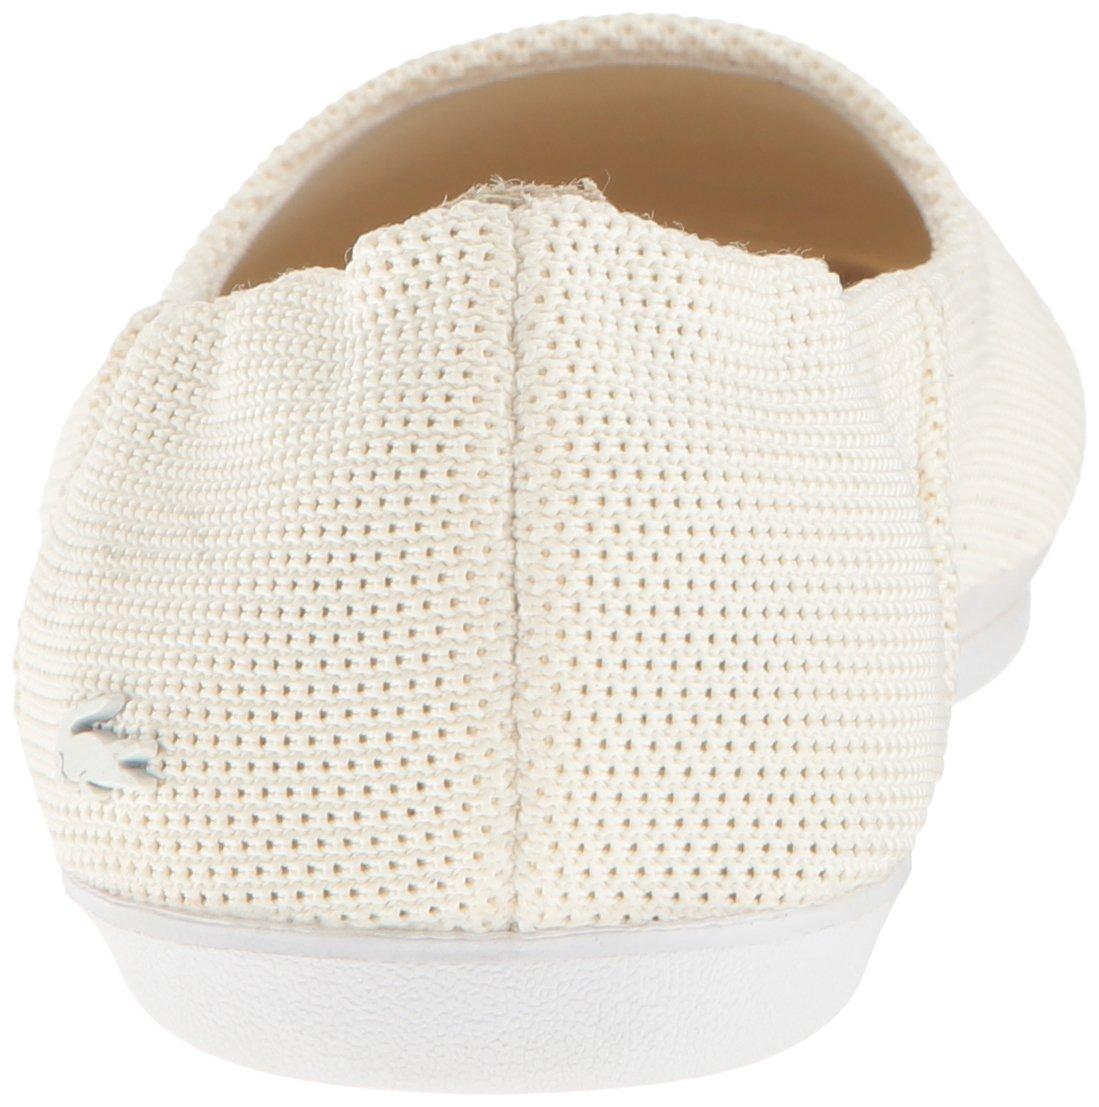 Lacoste Women's 5 Rosabel Slip 117 1 Fashion Sneaker B01M1EJJ3R 5 Women's B(M) US|Off White/White f101b8